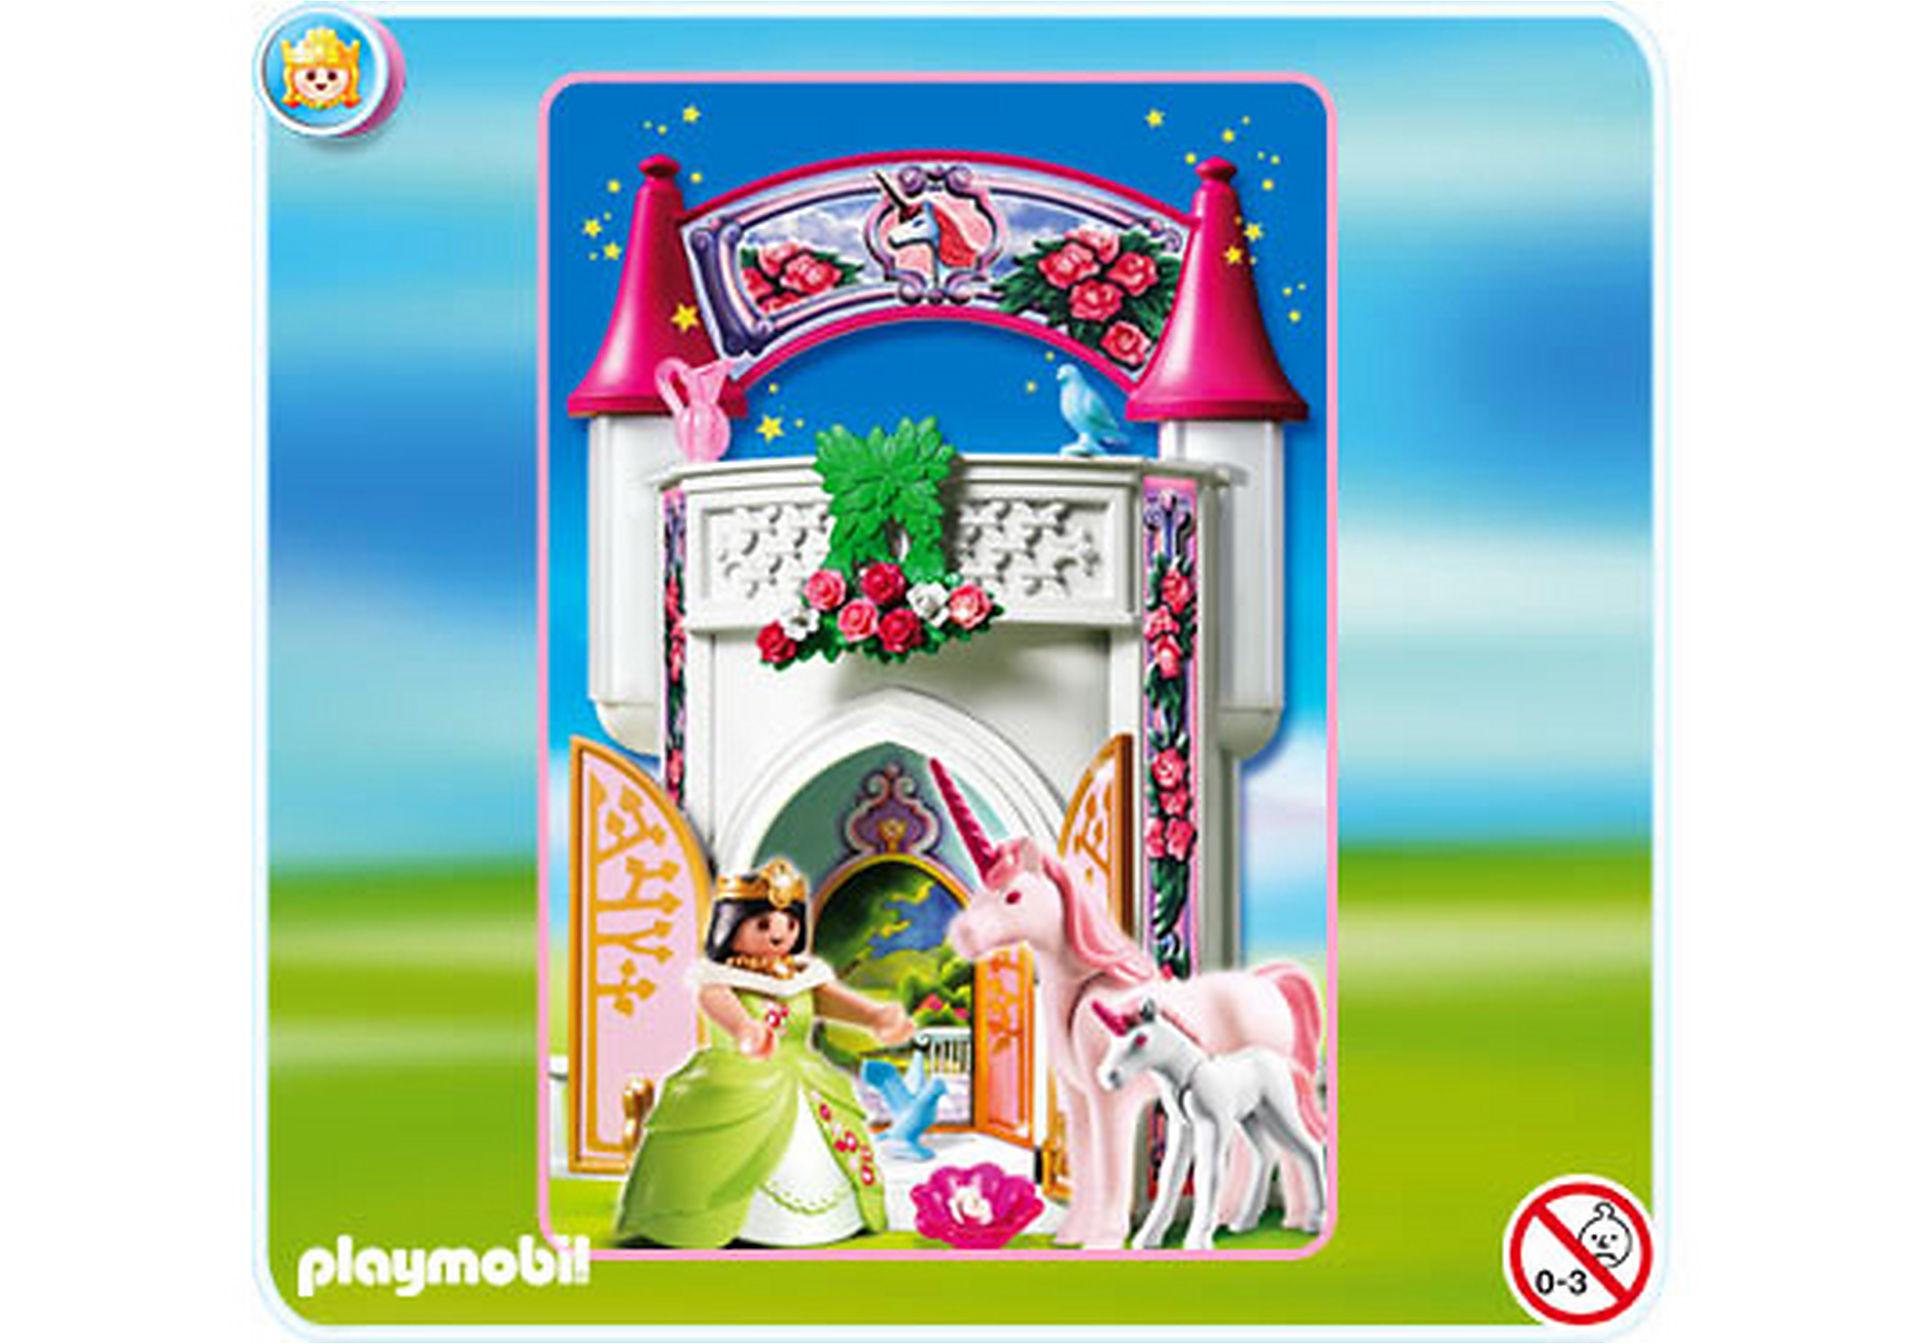 http://media.playmobil.com/i/playmobil/4777-A_product_detail/Einhorntürmchen zum Mitnehmen